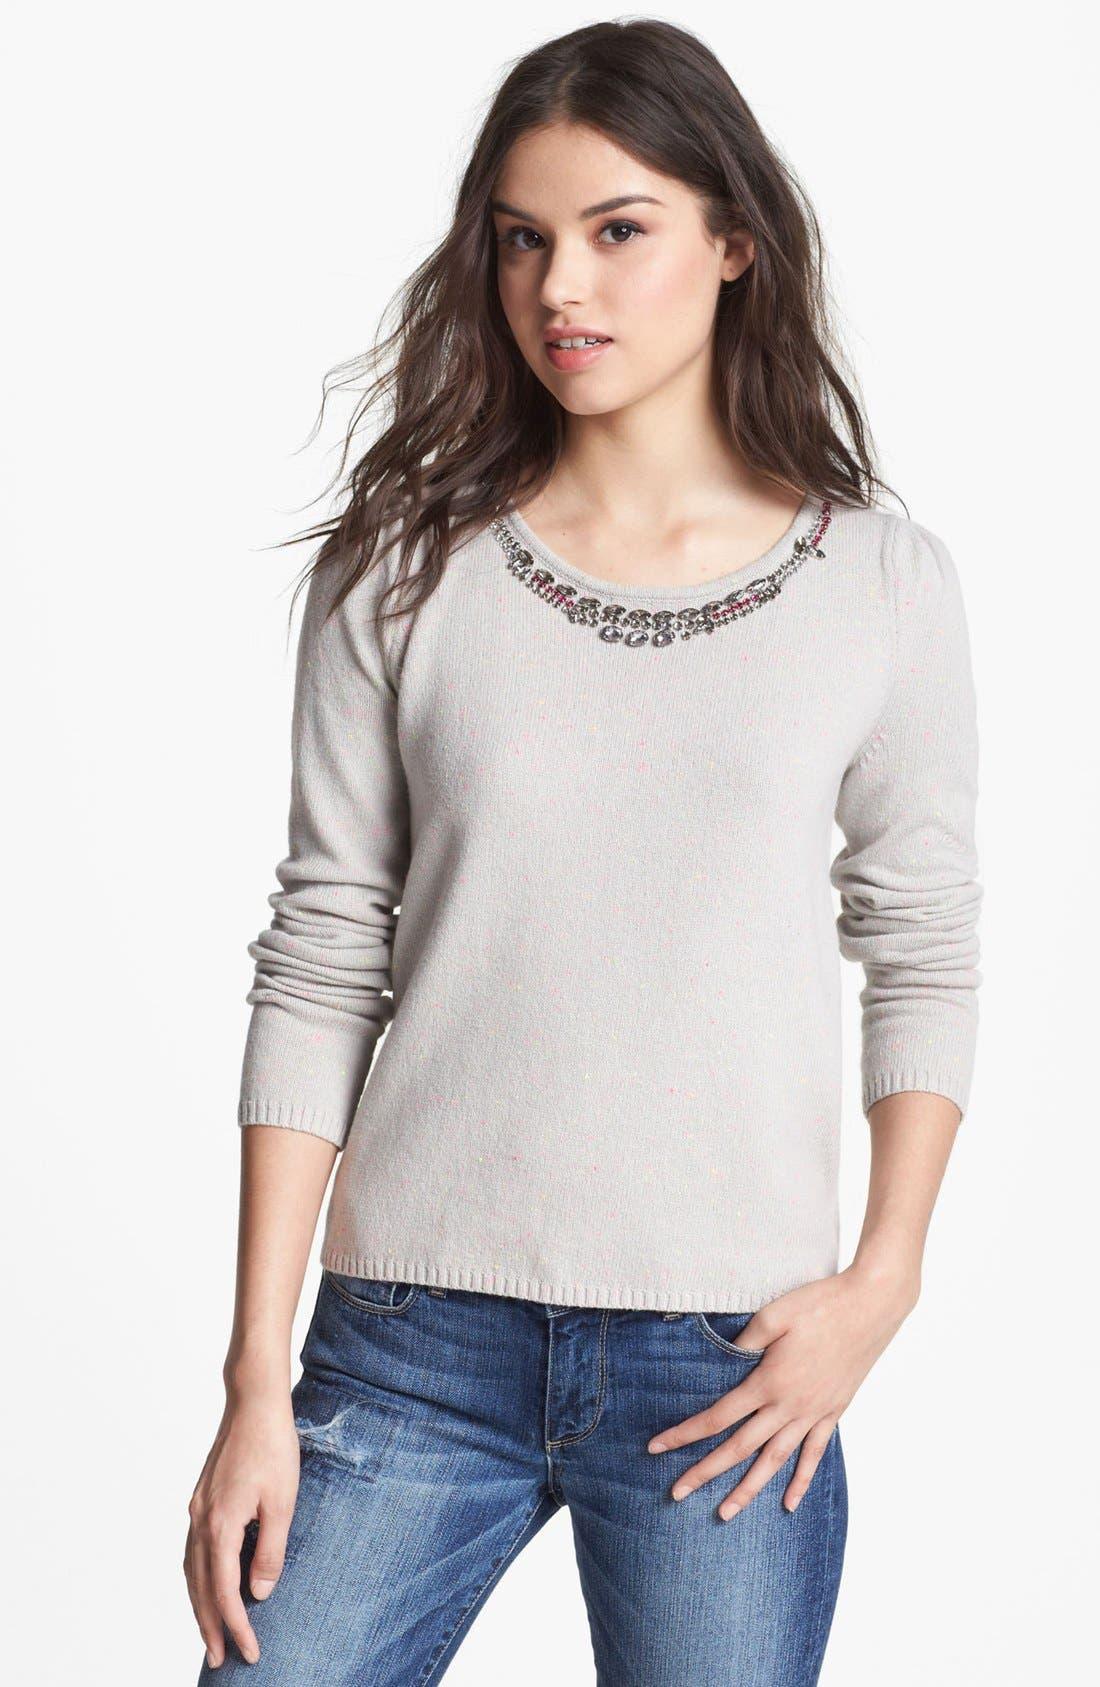 Alternate Image 1 Selected - Hinge® Jewel Embellished Sweater